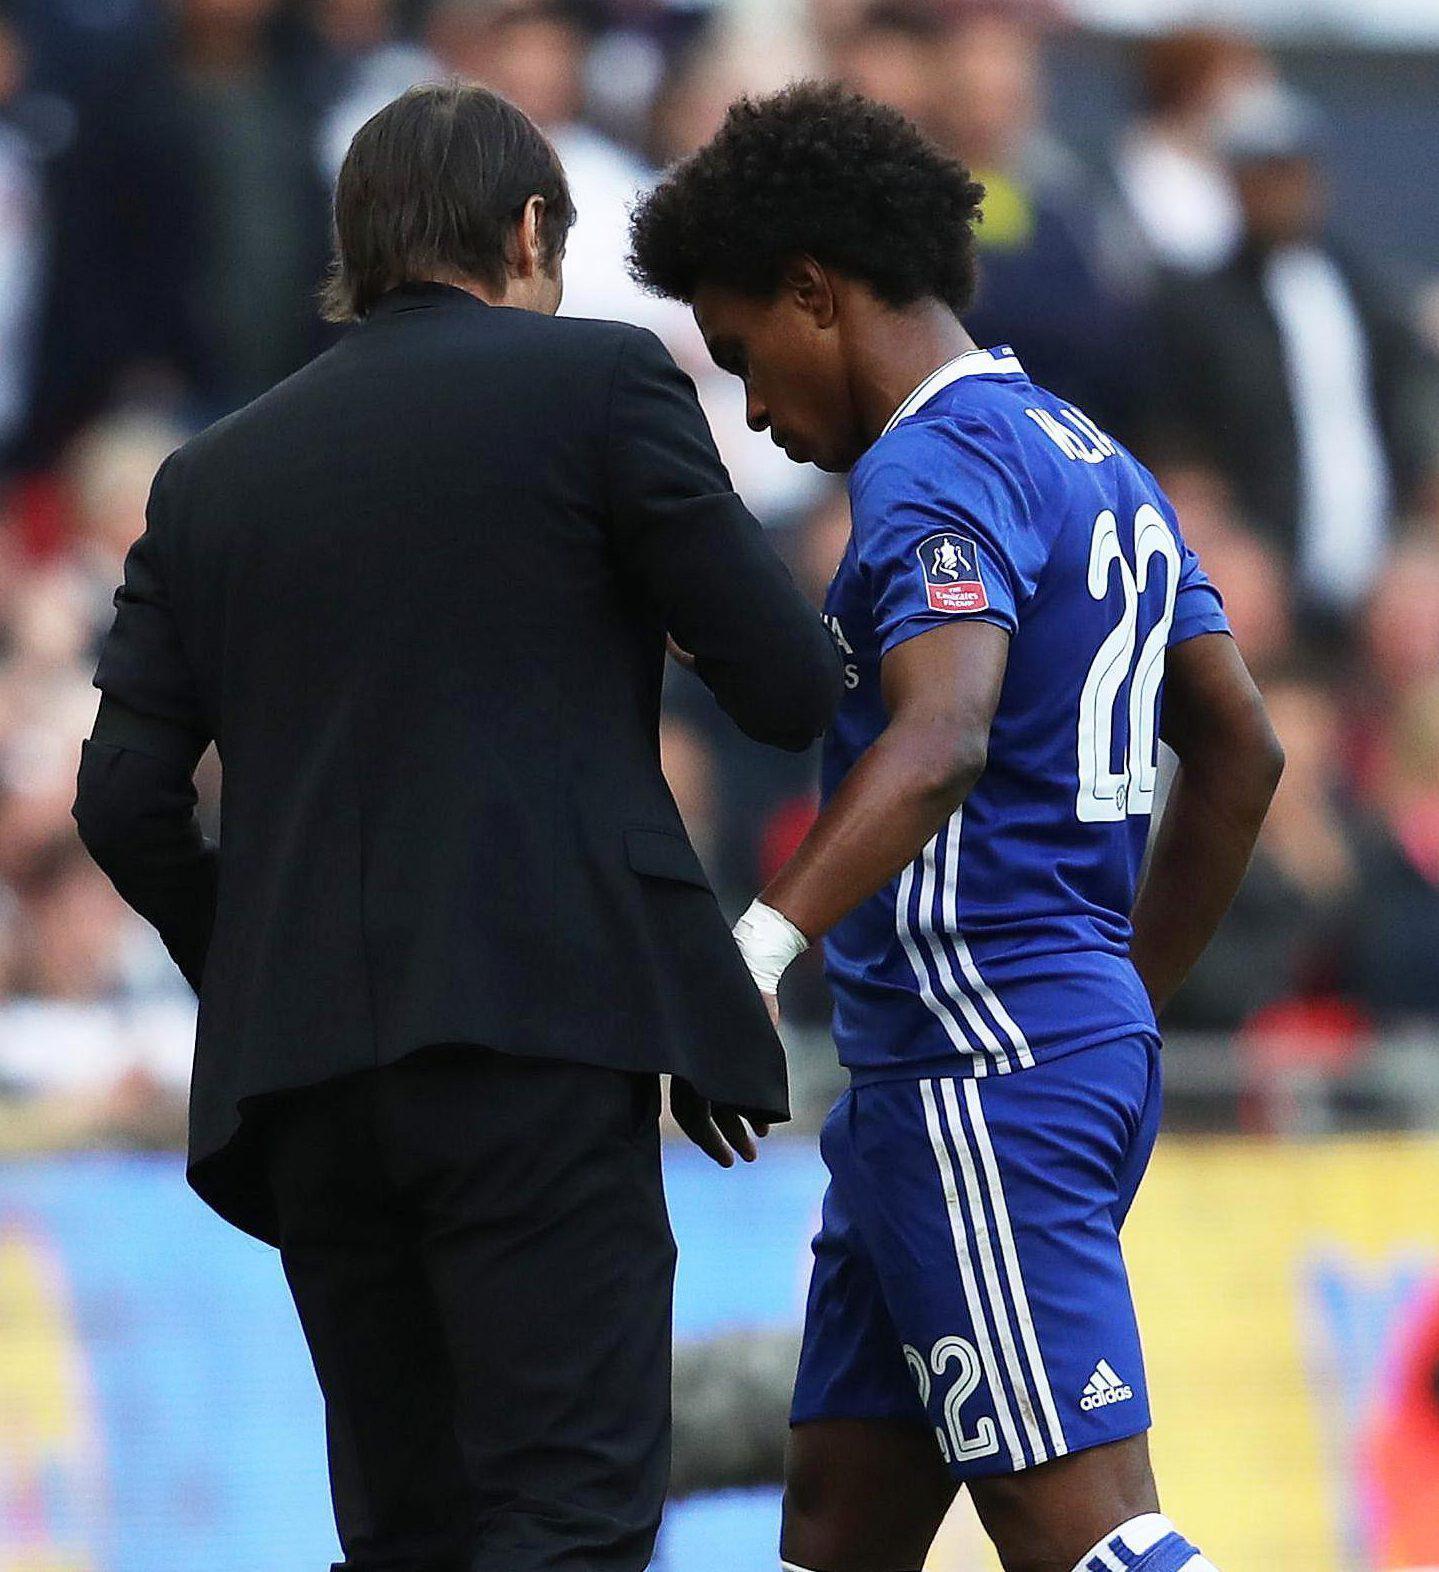 Antonio Conte has used Willian sparingly during his time at Stamford Bridge